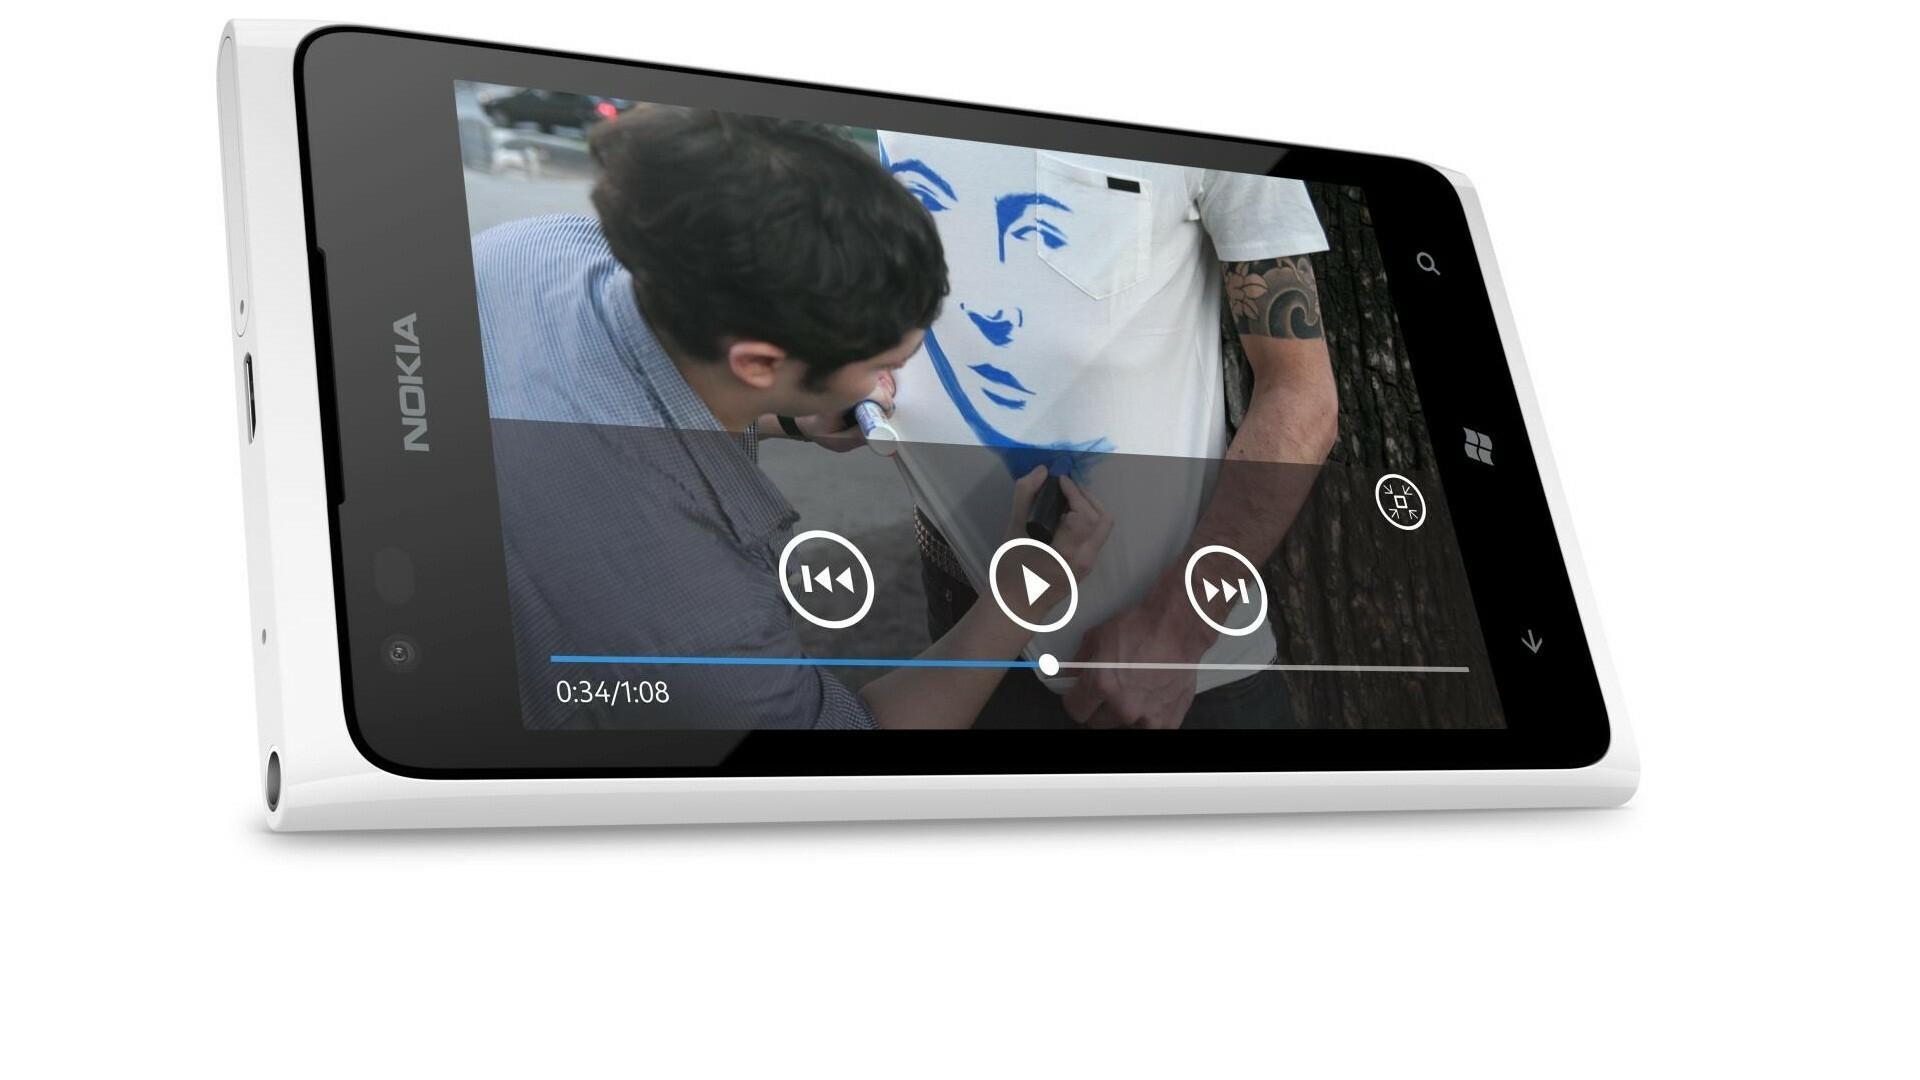 Concours Twitter Windows Phone France, gagnez un Nokia Lumia 900